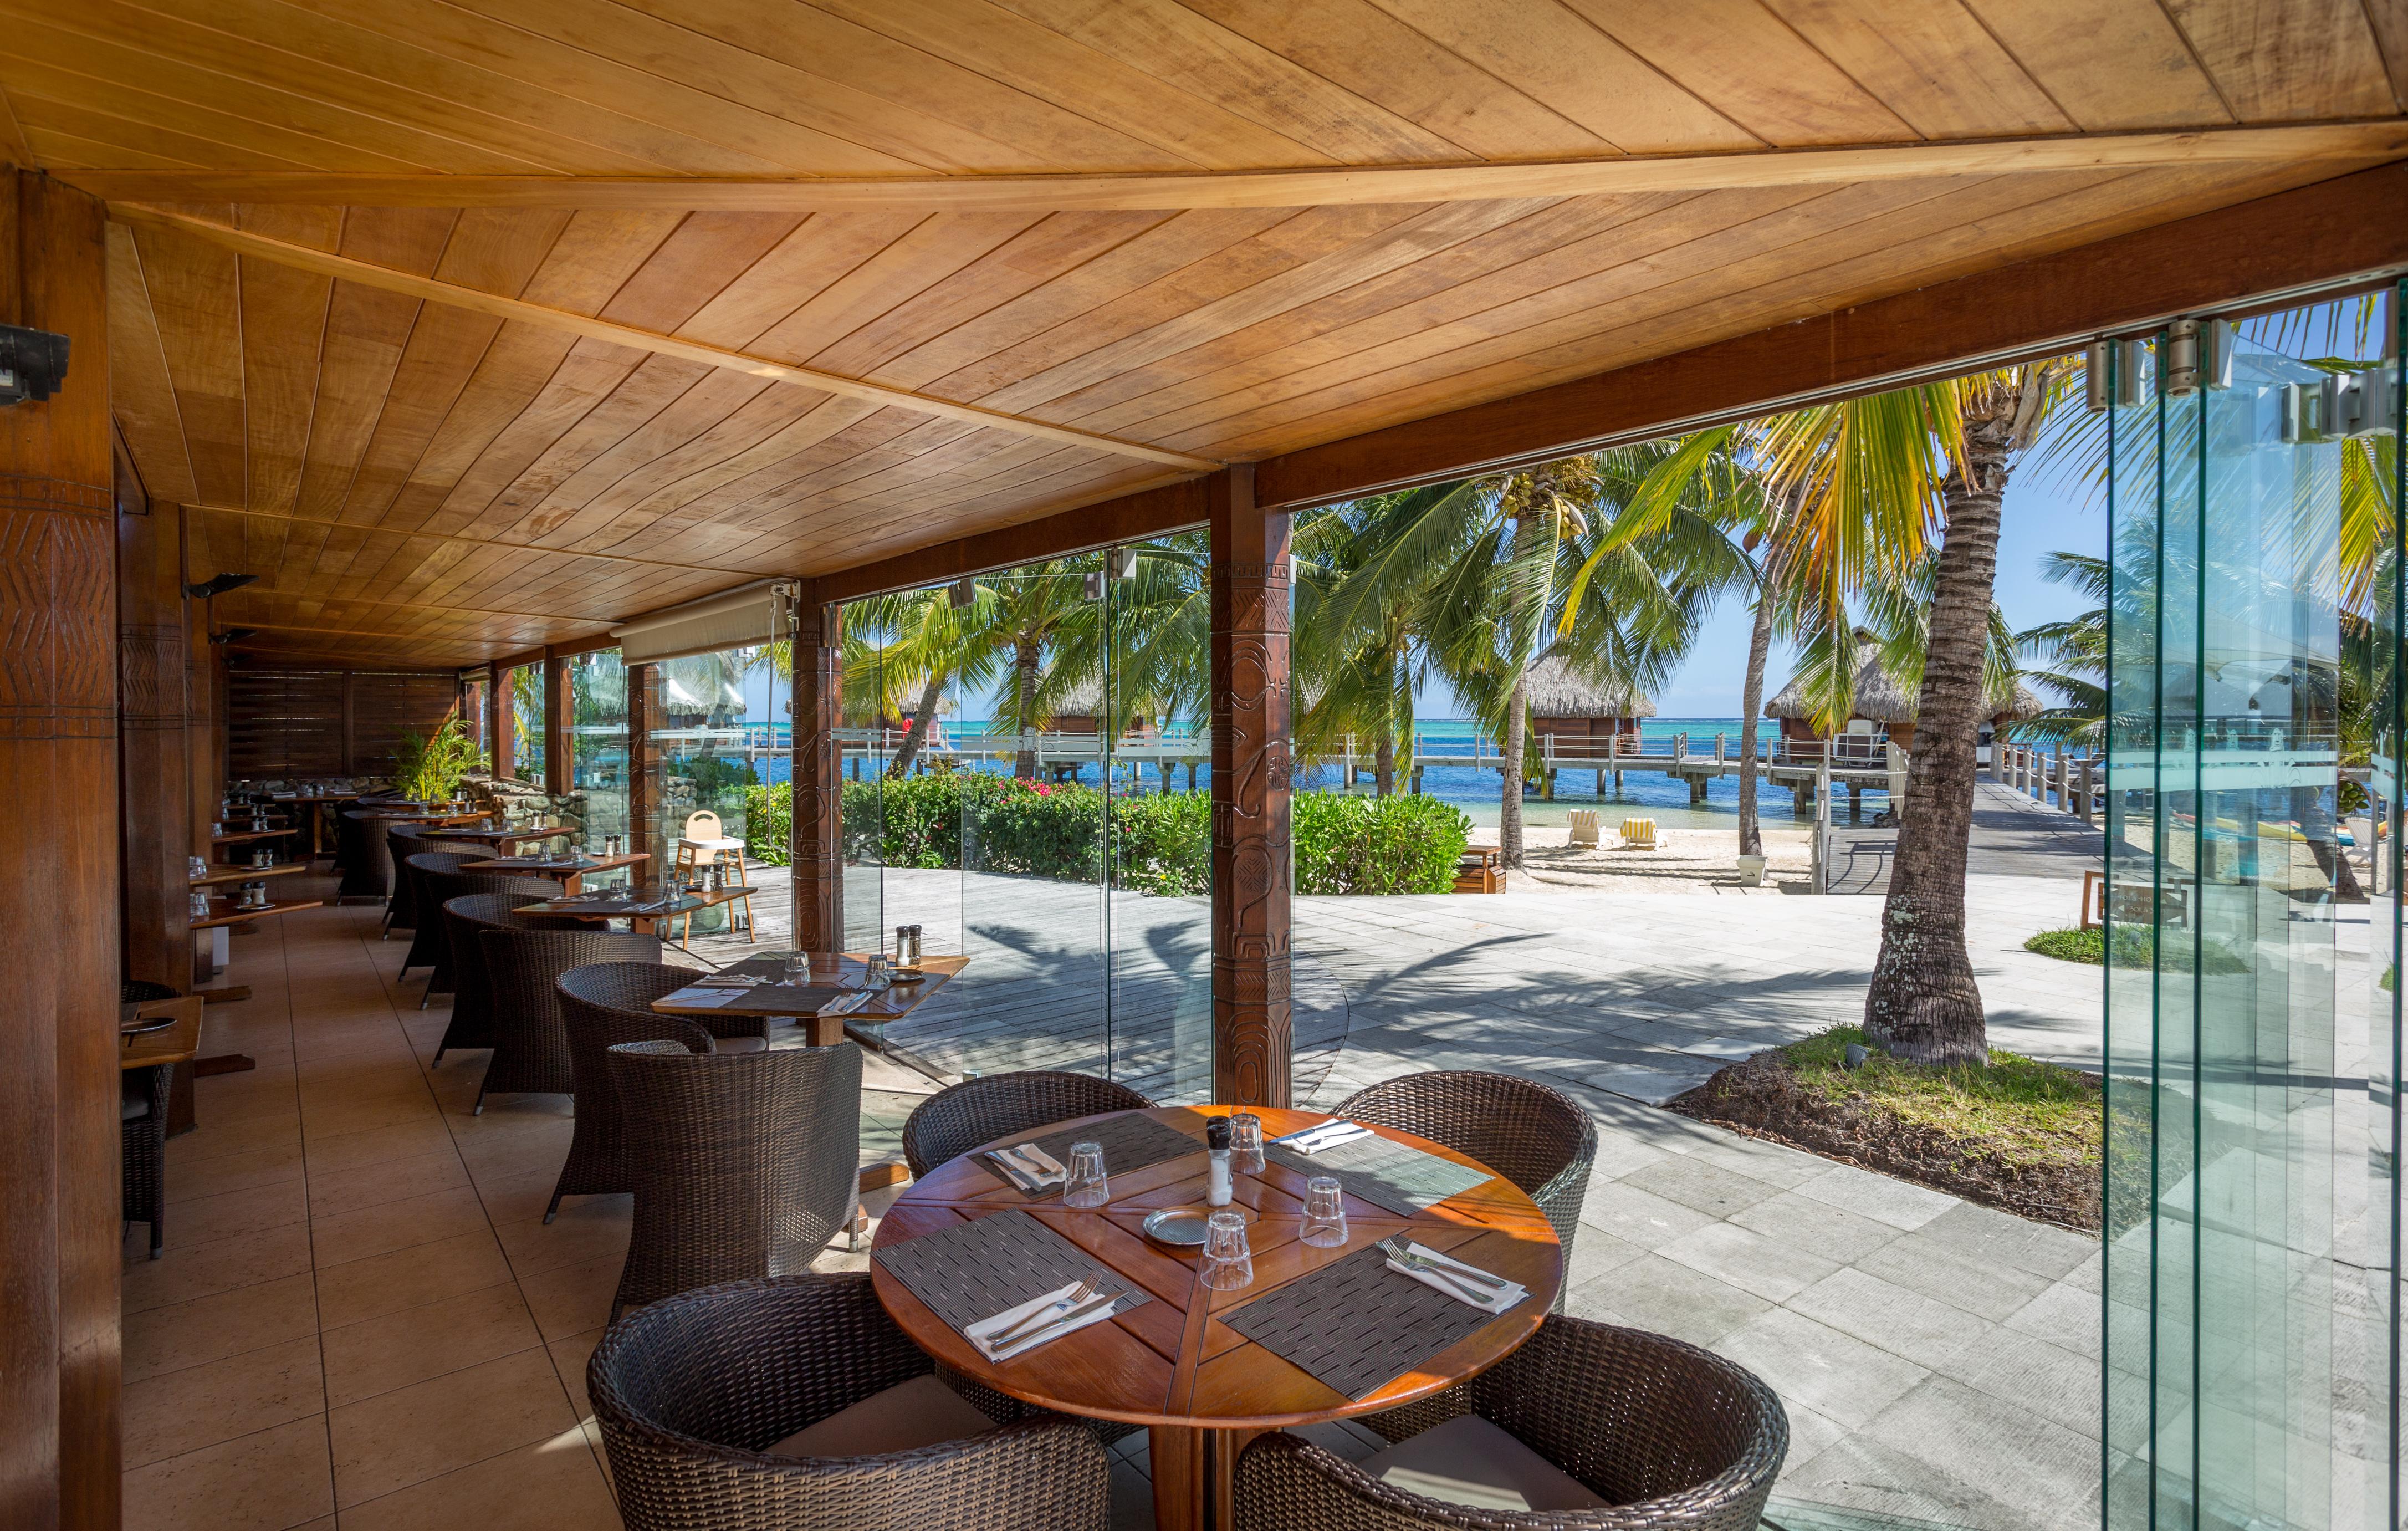 https://tahititourisme.uk/wp-content/uploads/2018/03/RESTAURATION-Restaurant-Mahanai-1-Charles_Veronese.jpg